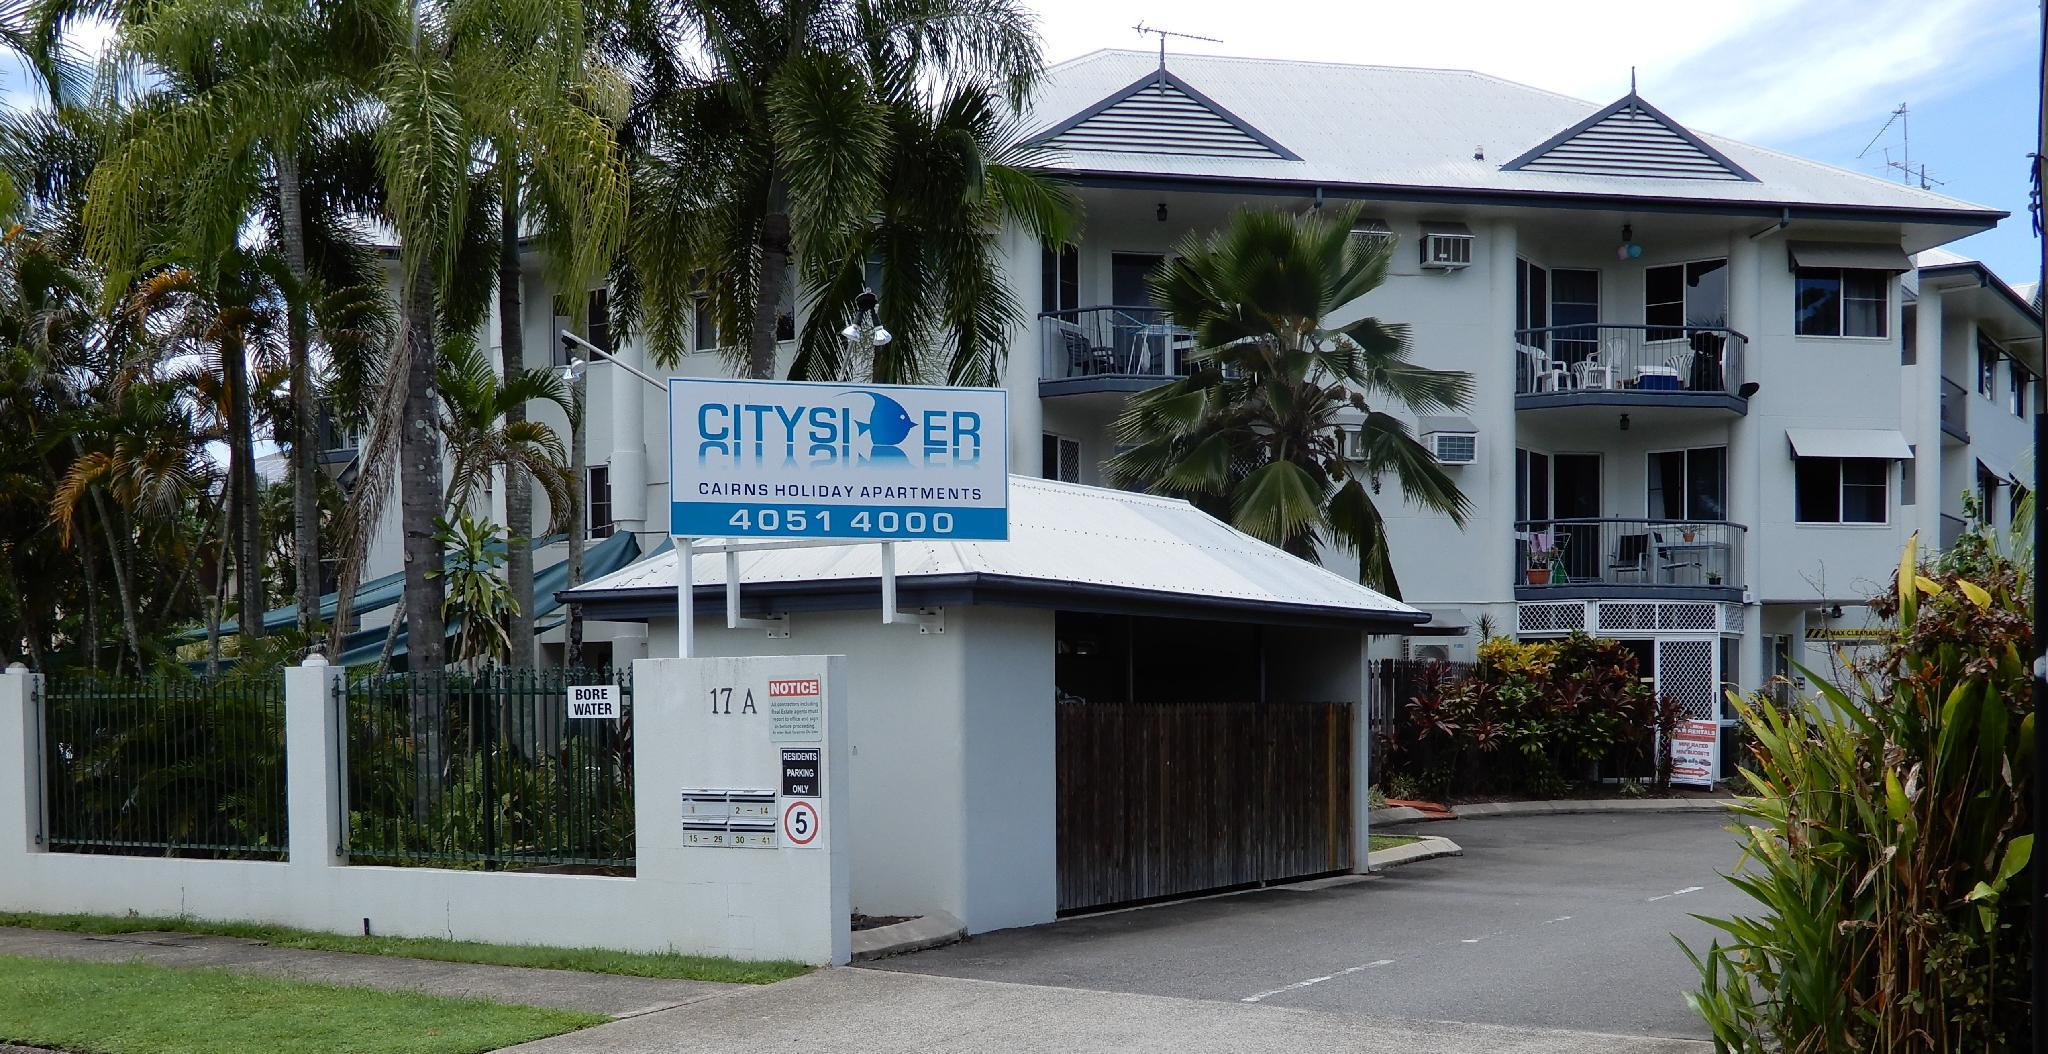 Citysider Apartments